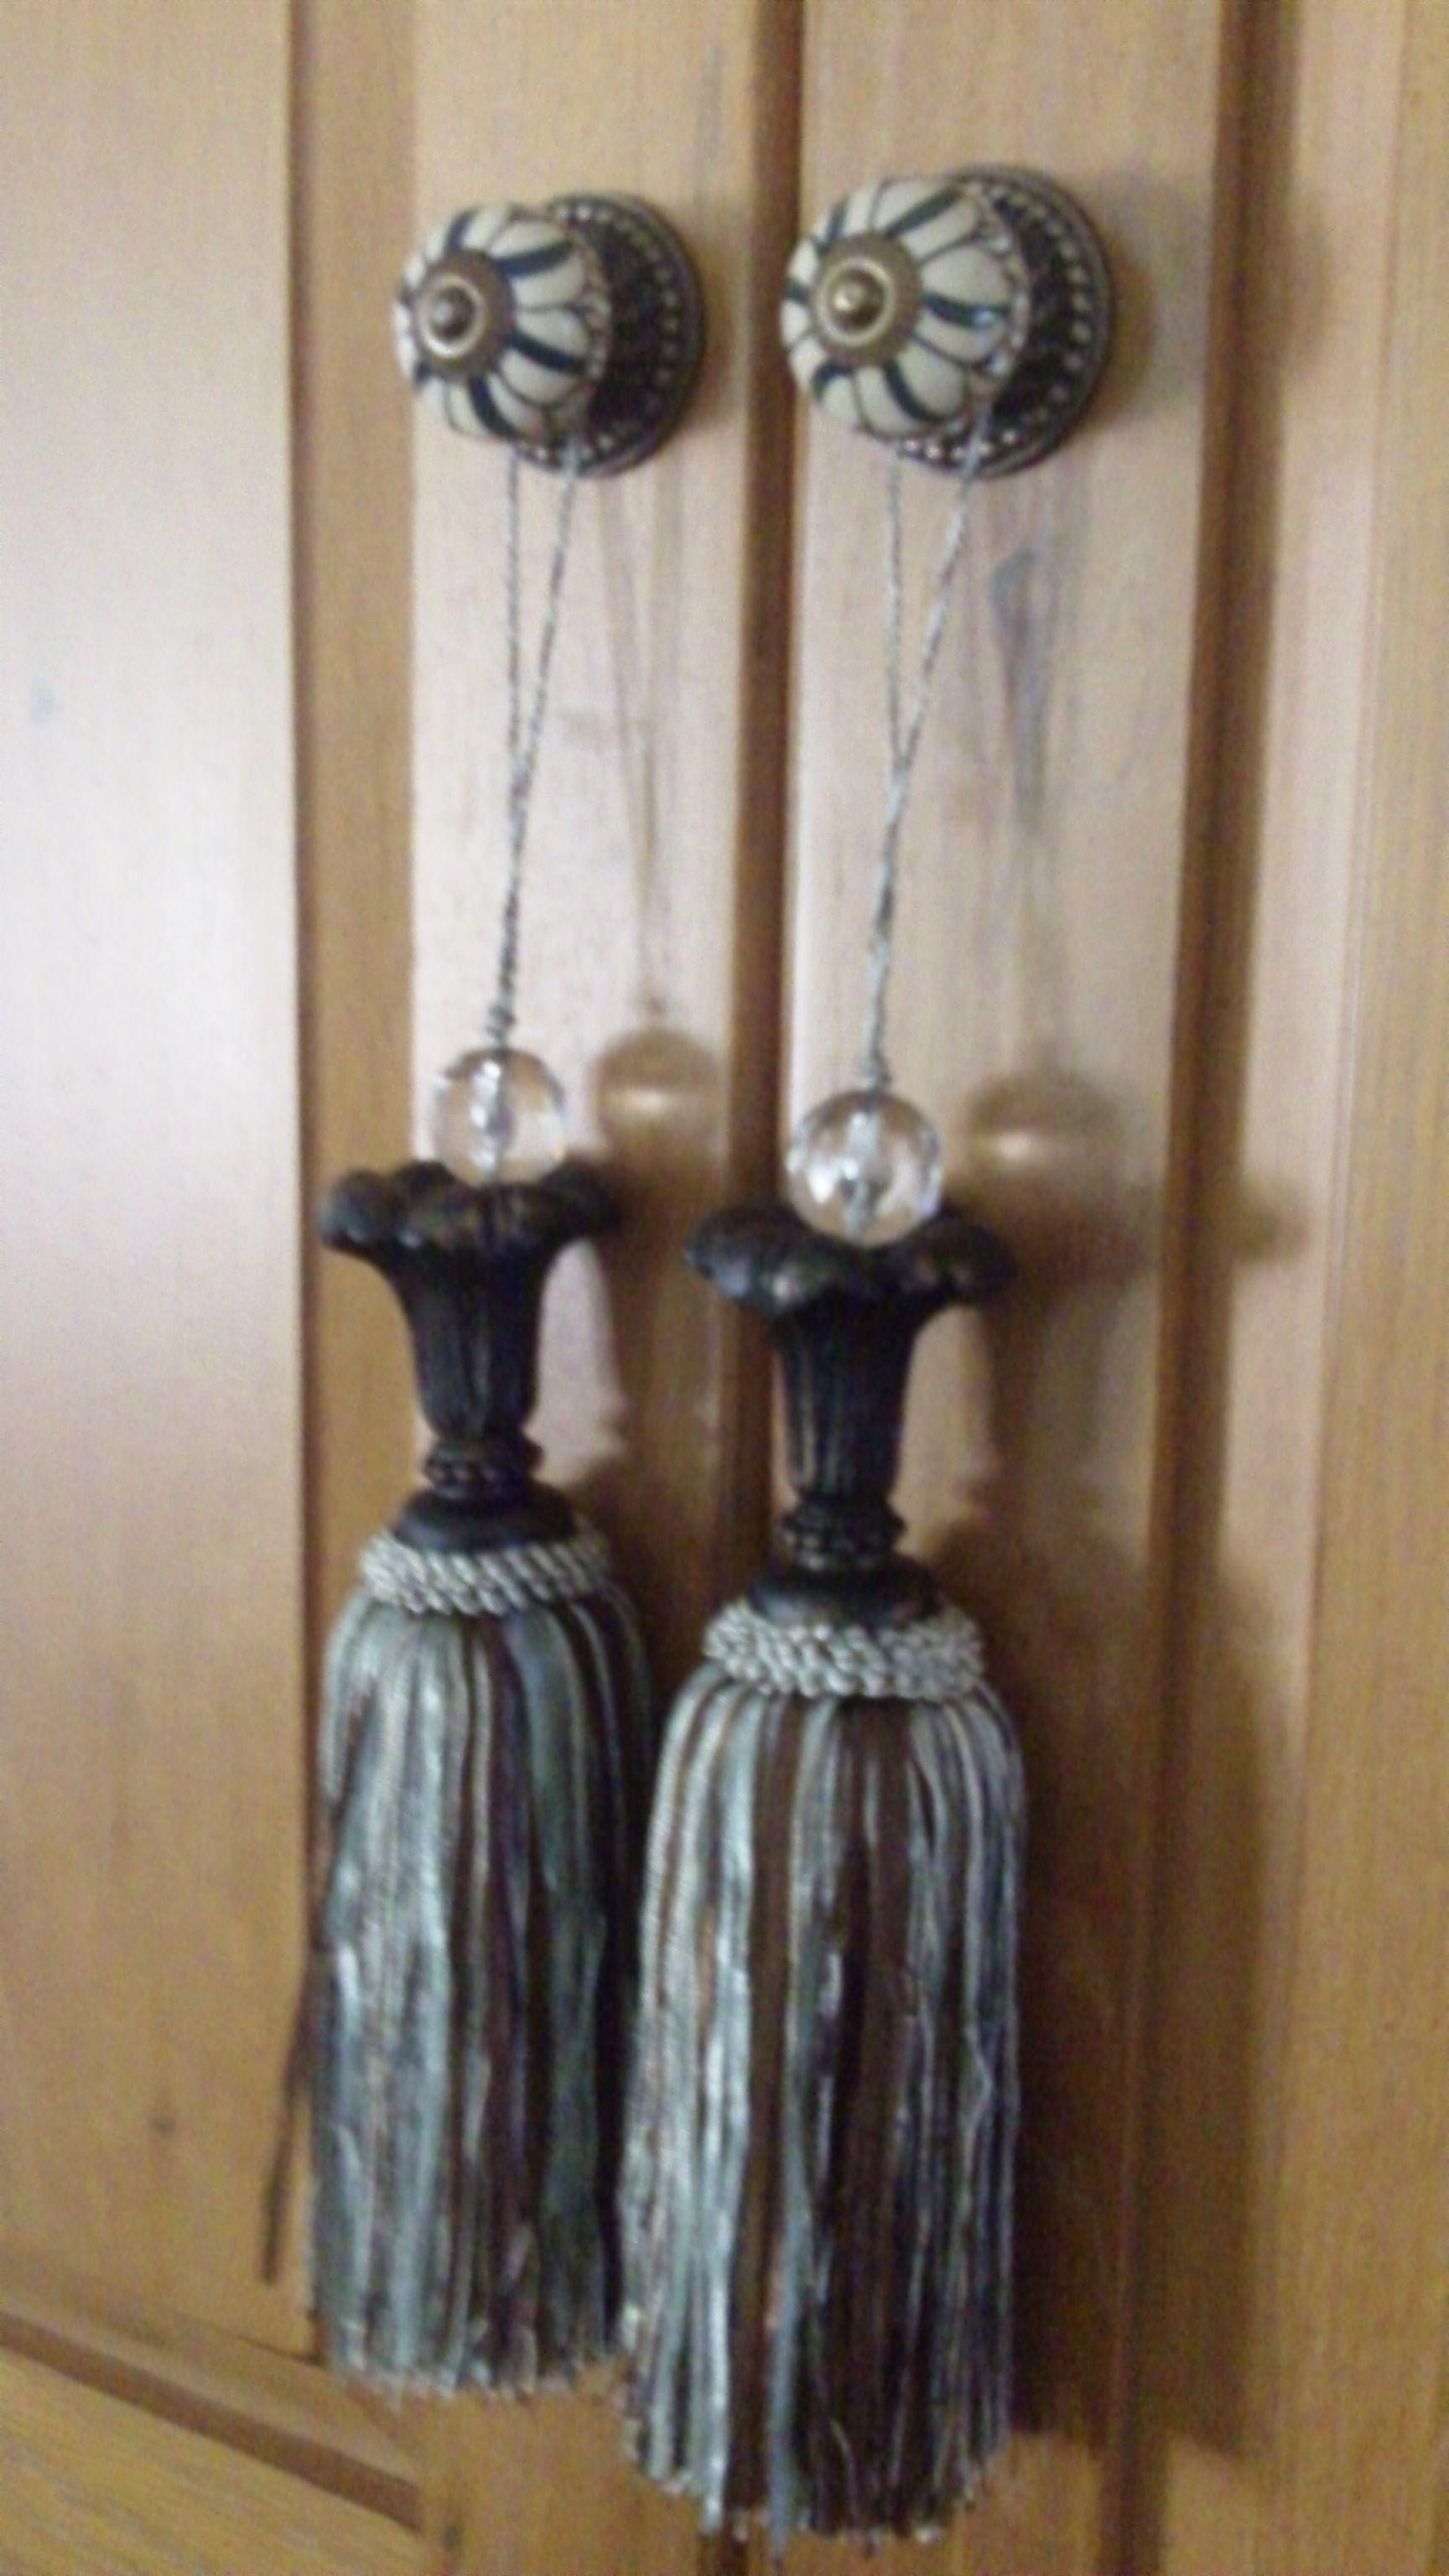 Tassels Hobby Lobby House Styles Tassels Wind Chimes